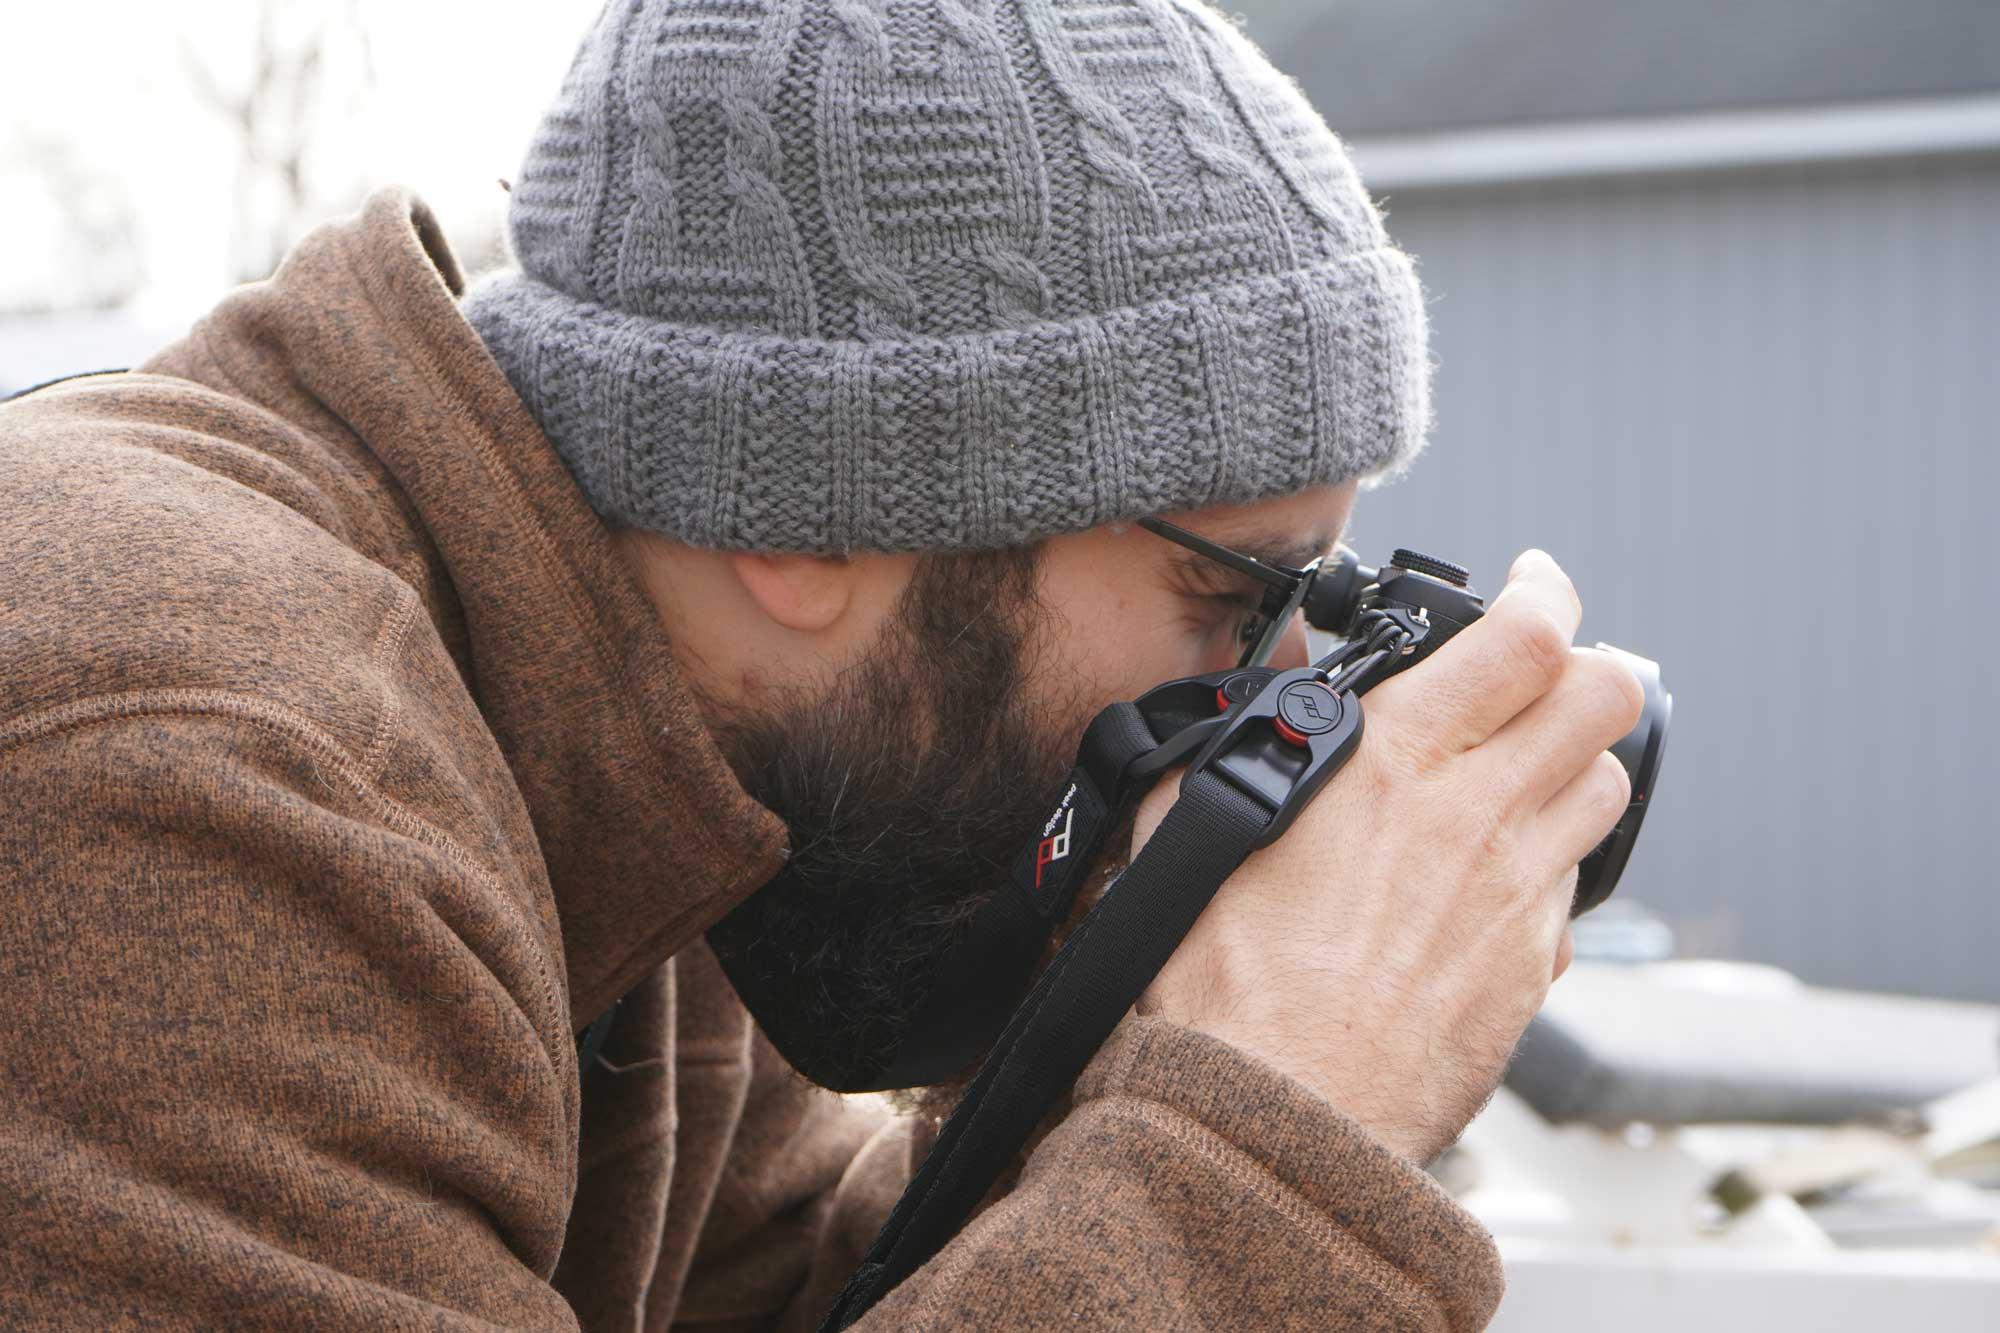 Ryan Calloway Portrait Photo Taking Photos